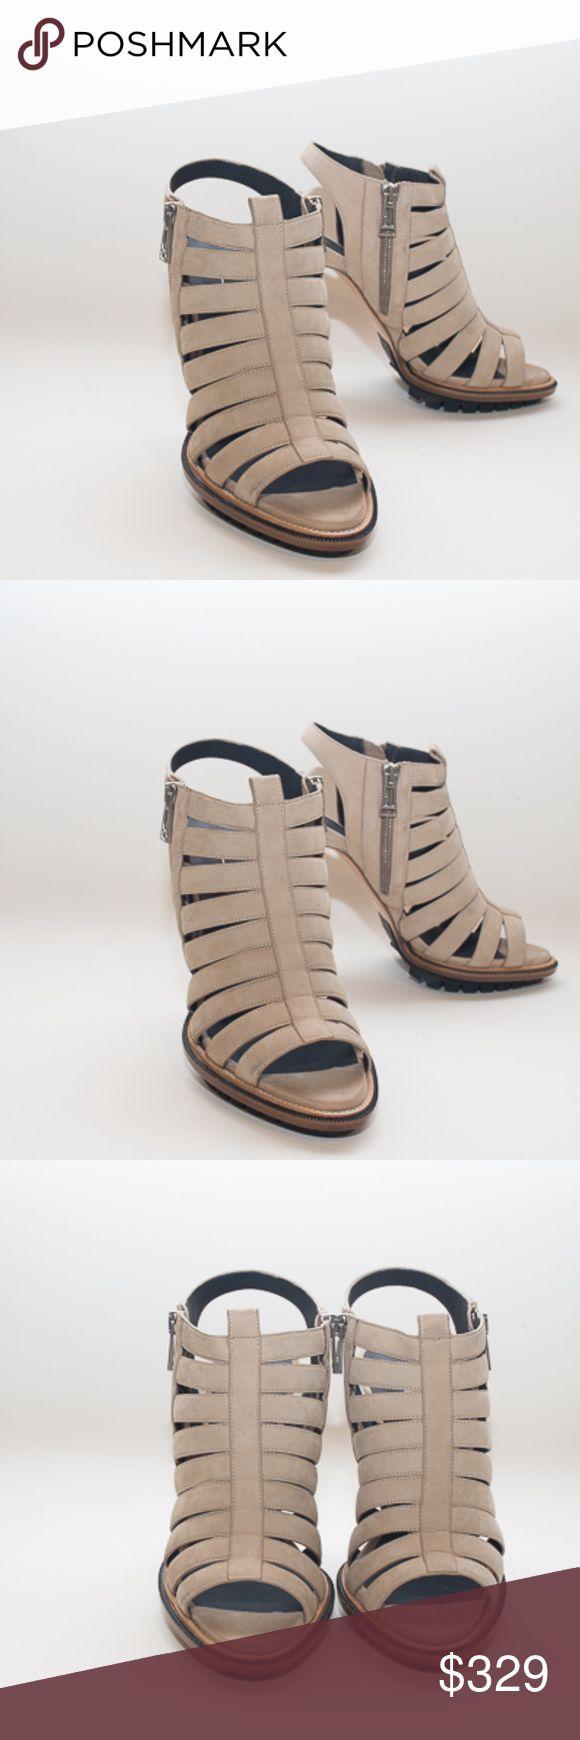 Belstaff Pelham Platform Sandal Women's Size 38 Belstaff Pelham Platform Sandals  New in box, without tags Authentic Belstaff  Italian Women's size 38 Beige leather with lug sole for excellent grip Side zipper on both sides of the shoe Heel hight: 5 inches Belstaff Shoes Heels